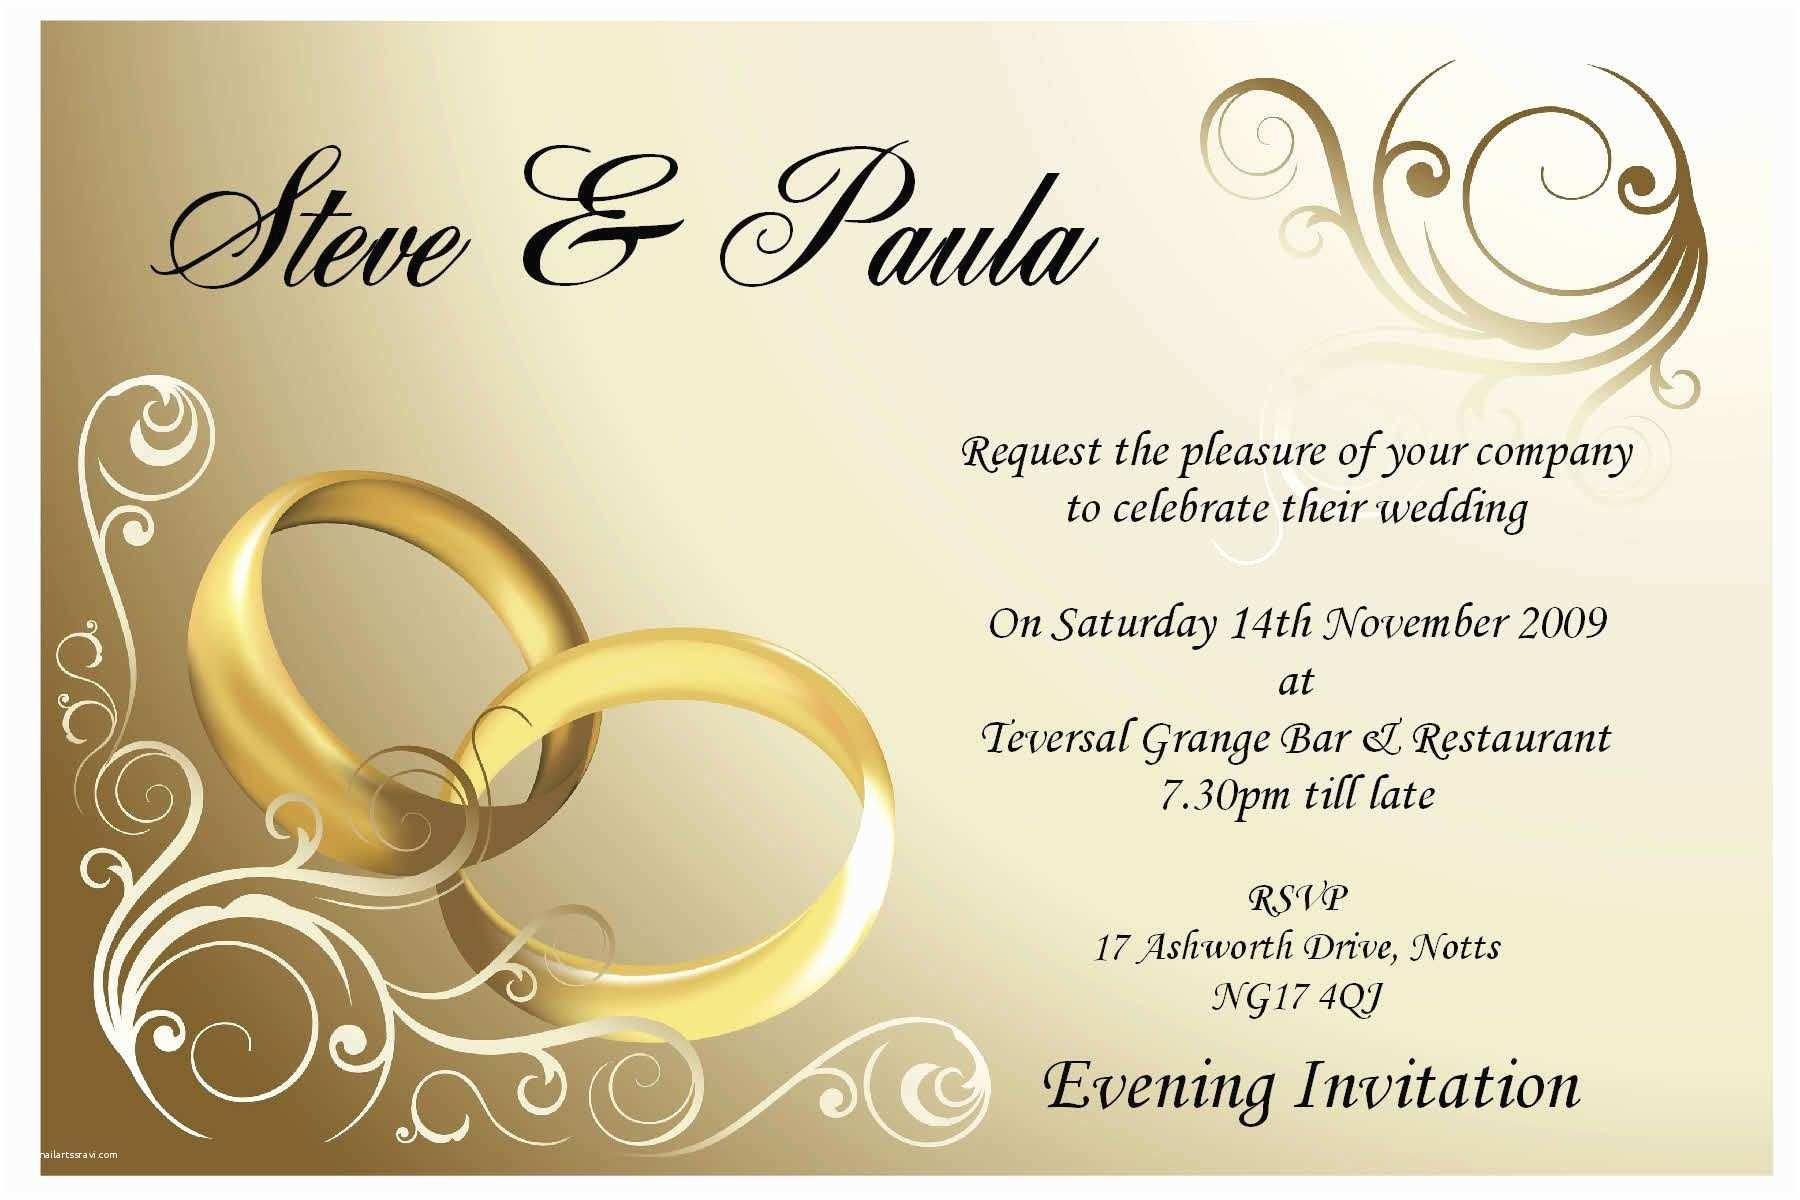 Wedding Invitation Cards Samples Affordable Wedding Invitation Card